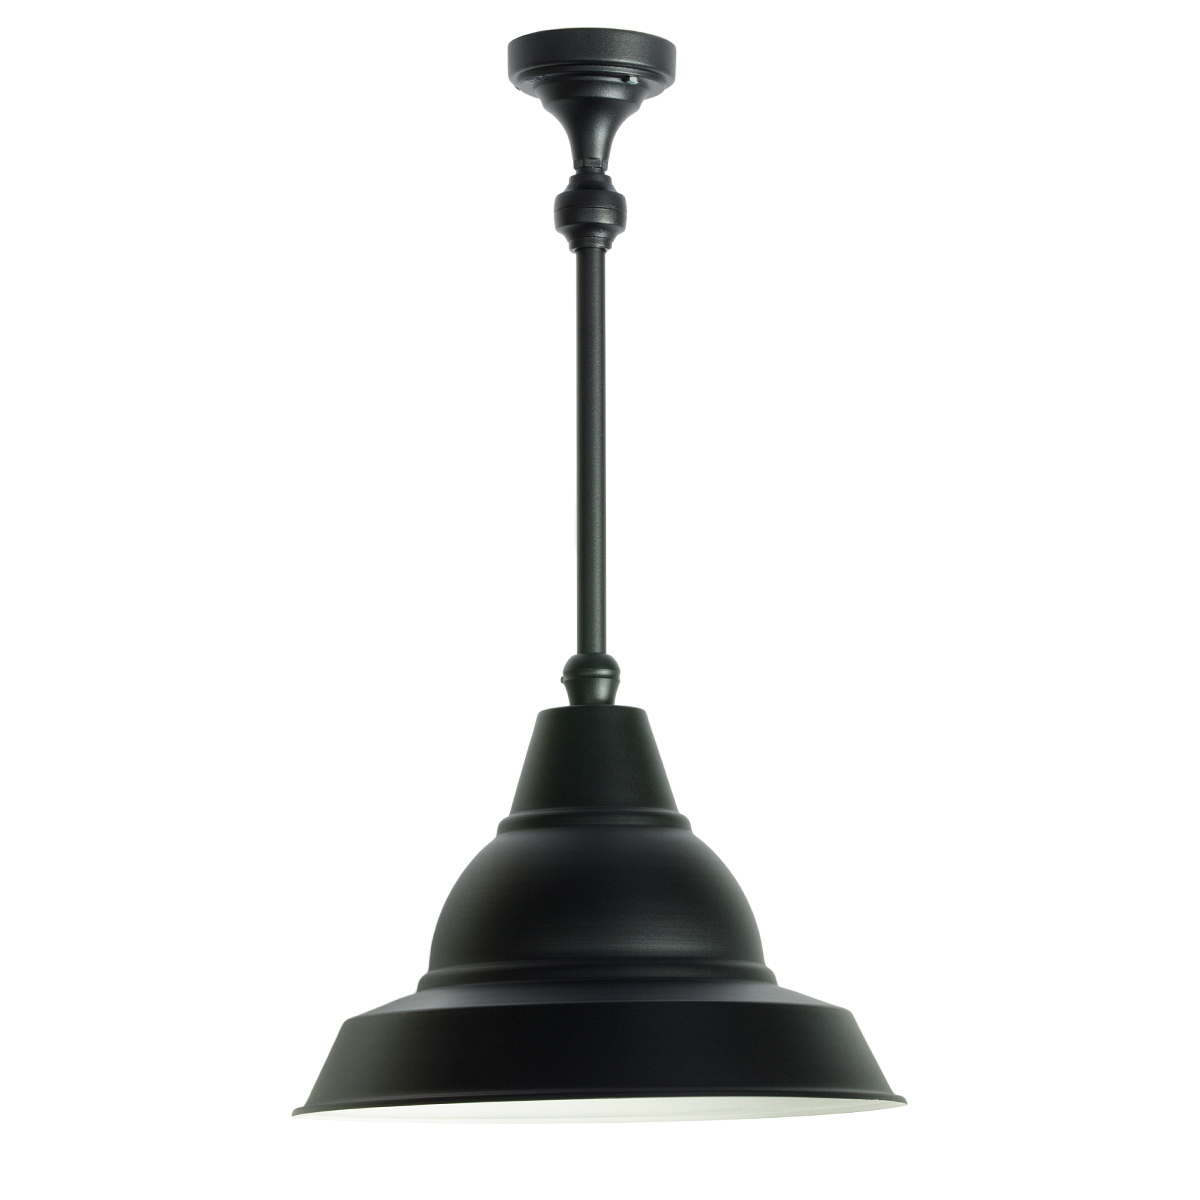 deckenlampe deckenlampe rustikal glas leuchten massiv holz in deckenlampe flg cm goldfarben u. Black Bedroom Furniture Sets. Home Design Ideas